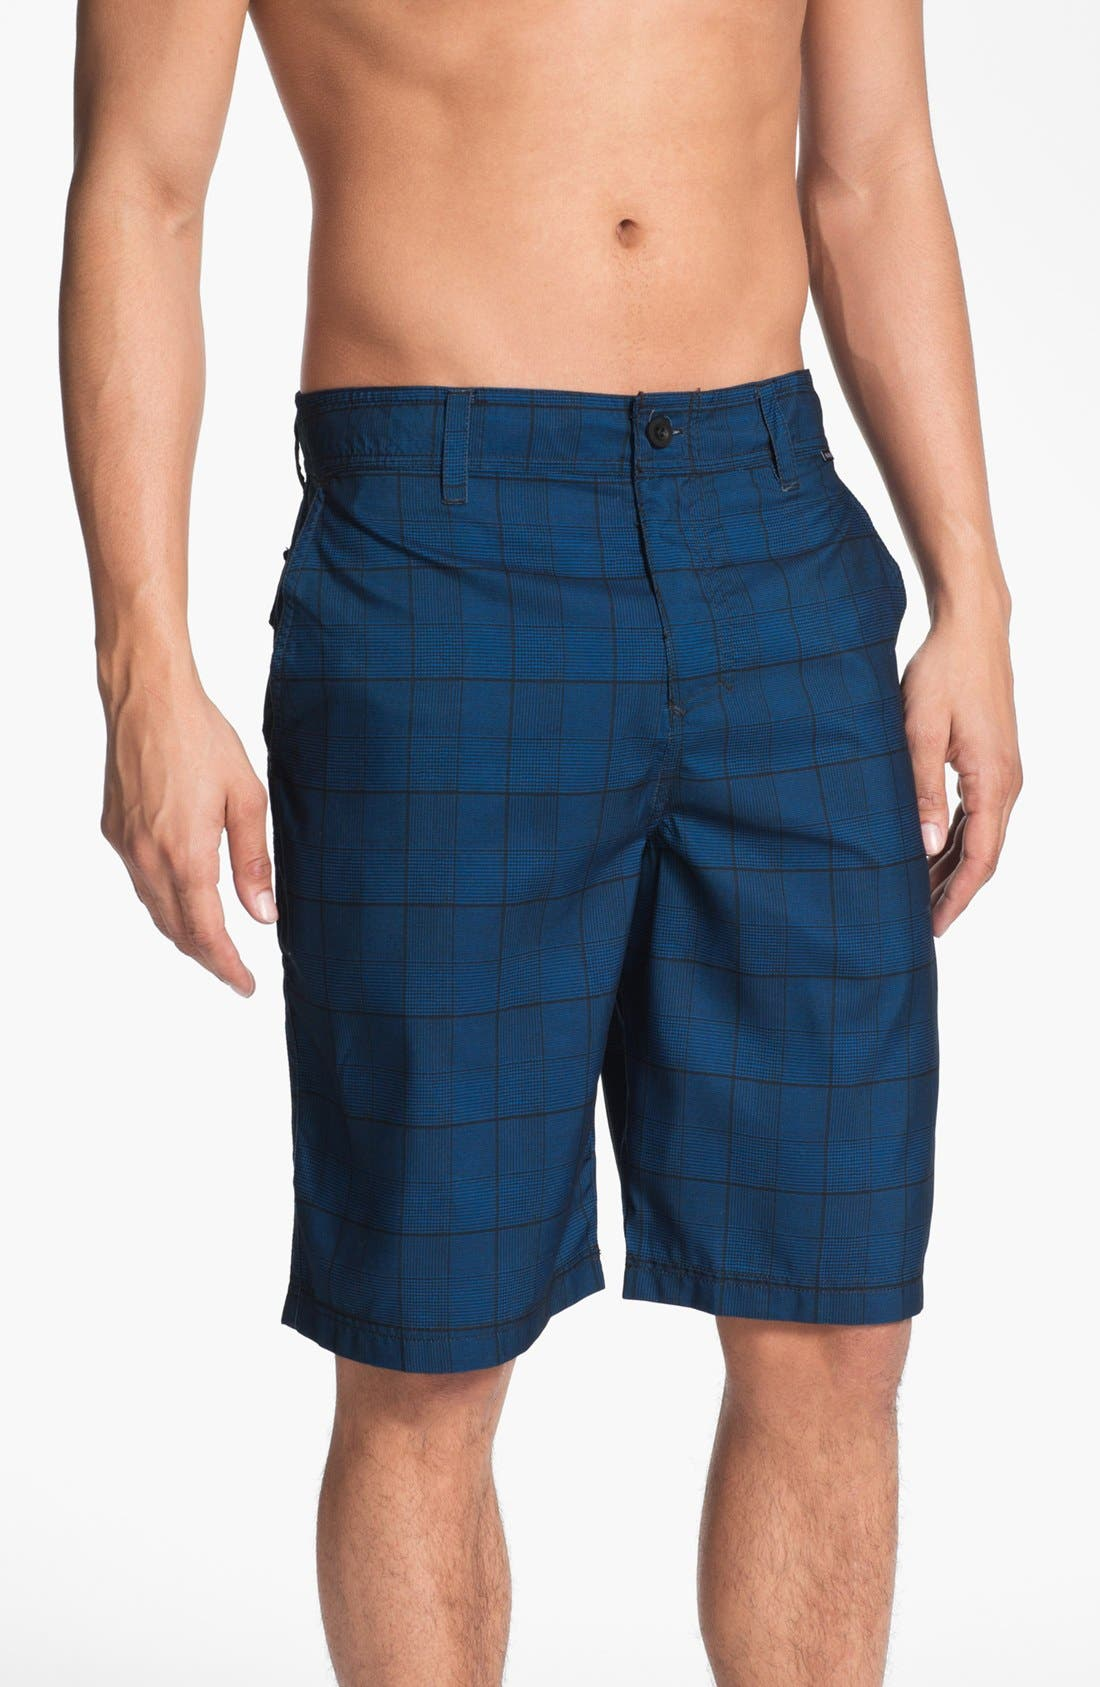 Alternate Image 1 Selected - Hurley 'Mariner Company' Shorts